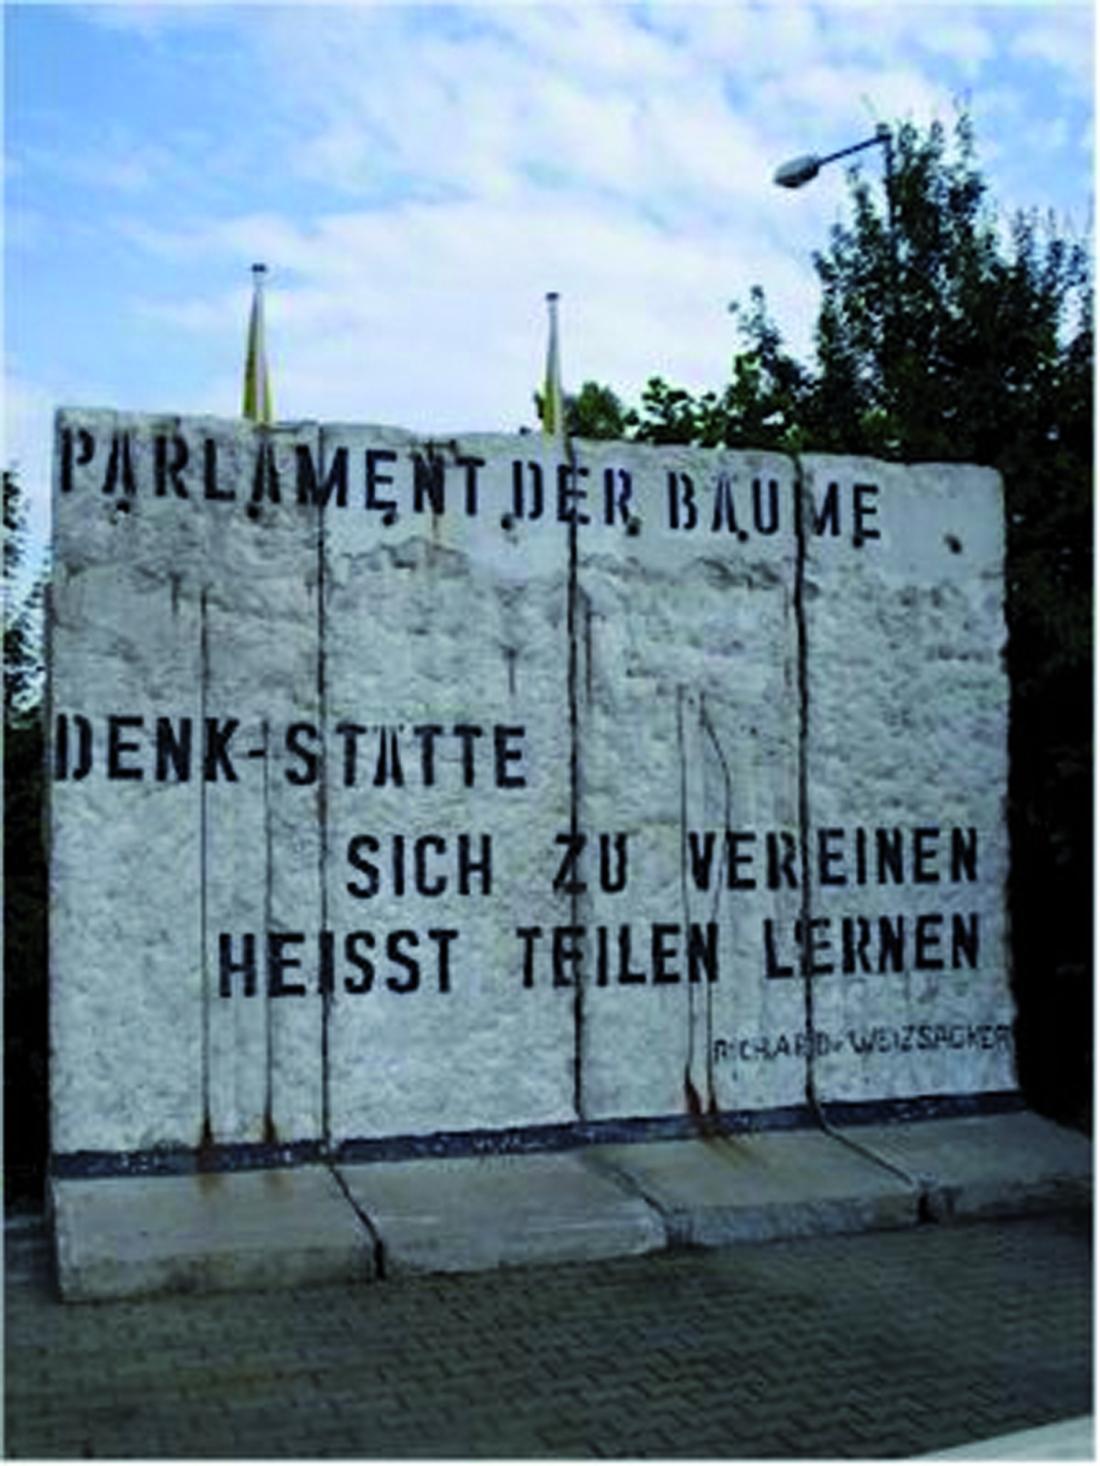 berlinwall_08a.300dpi